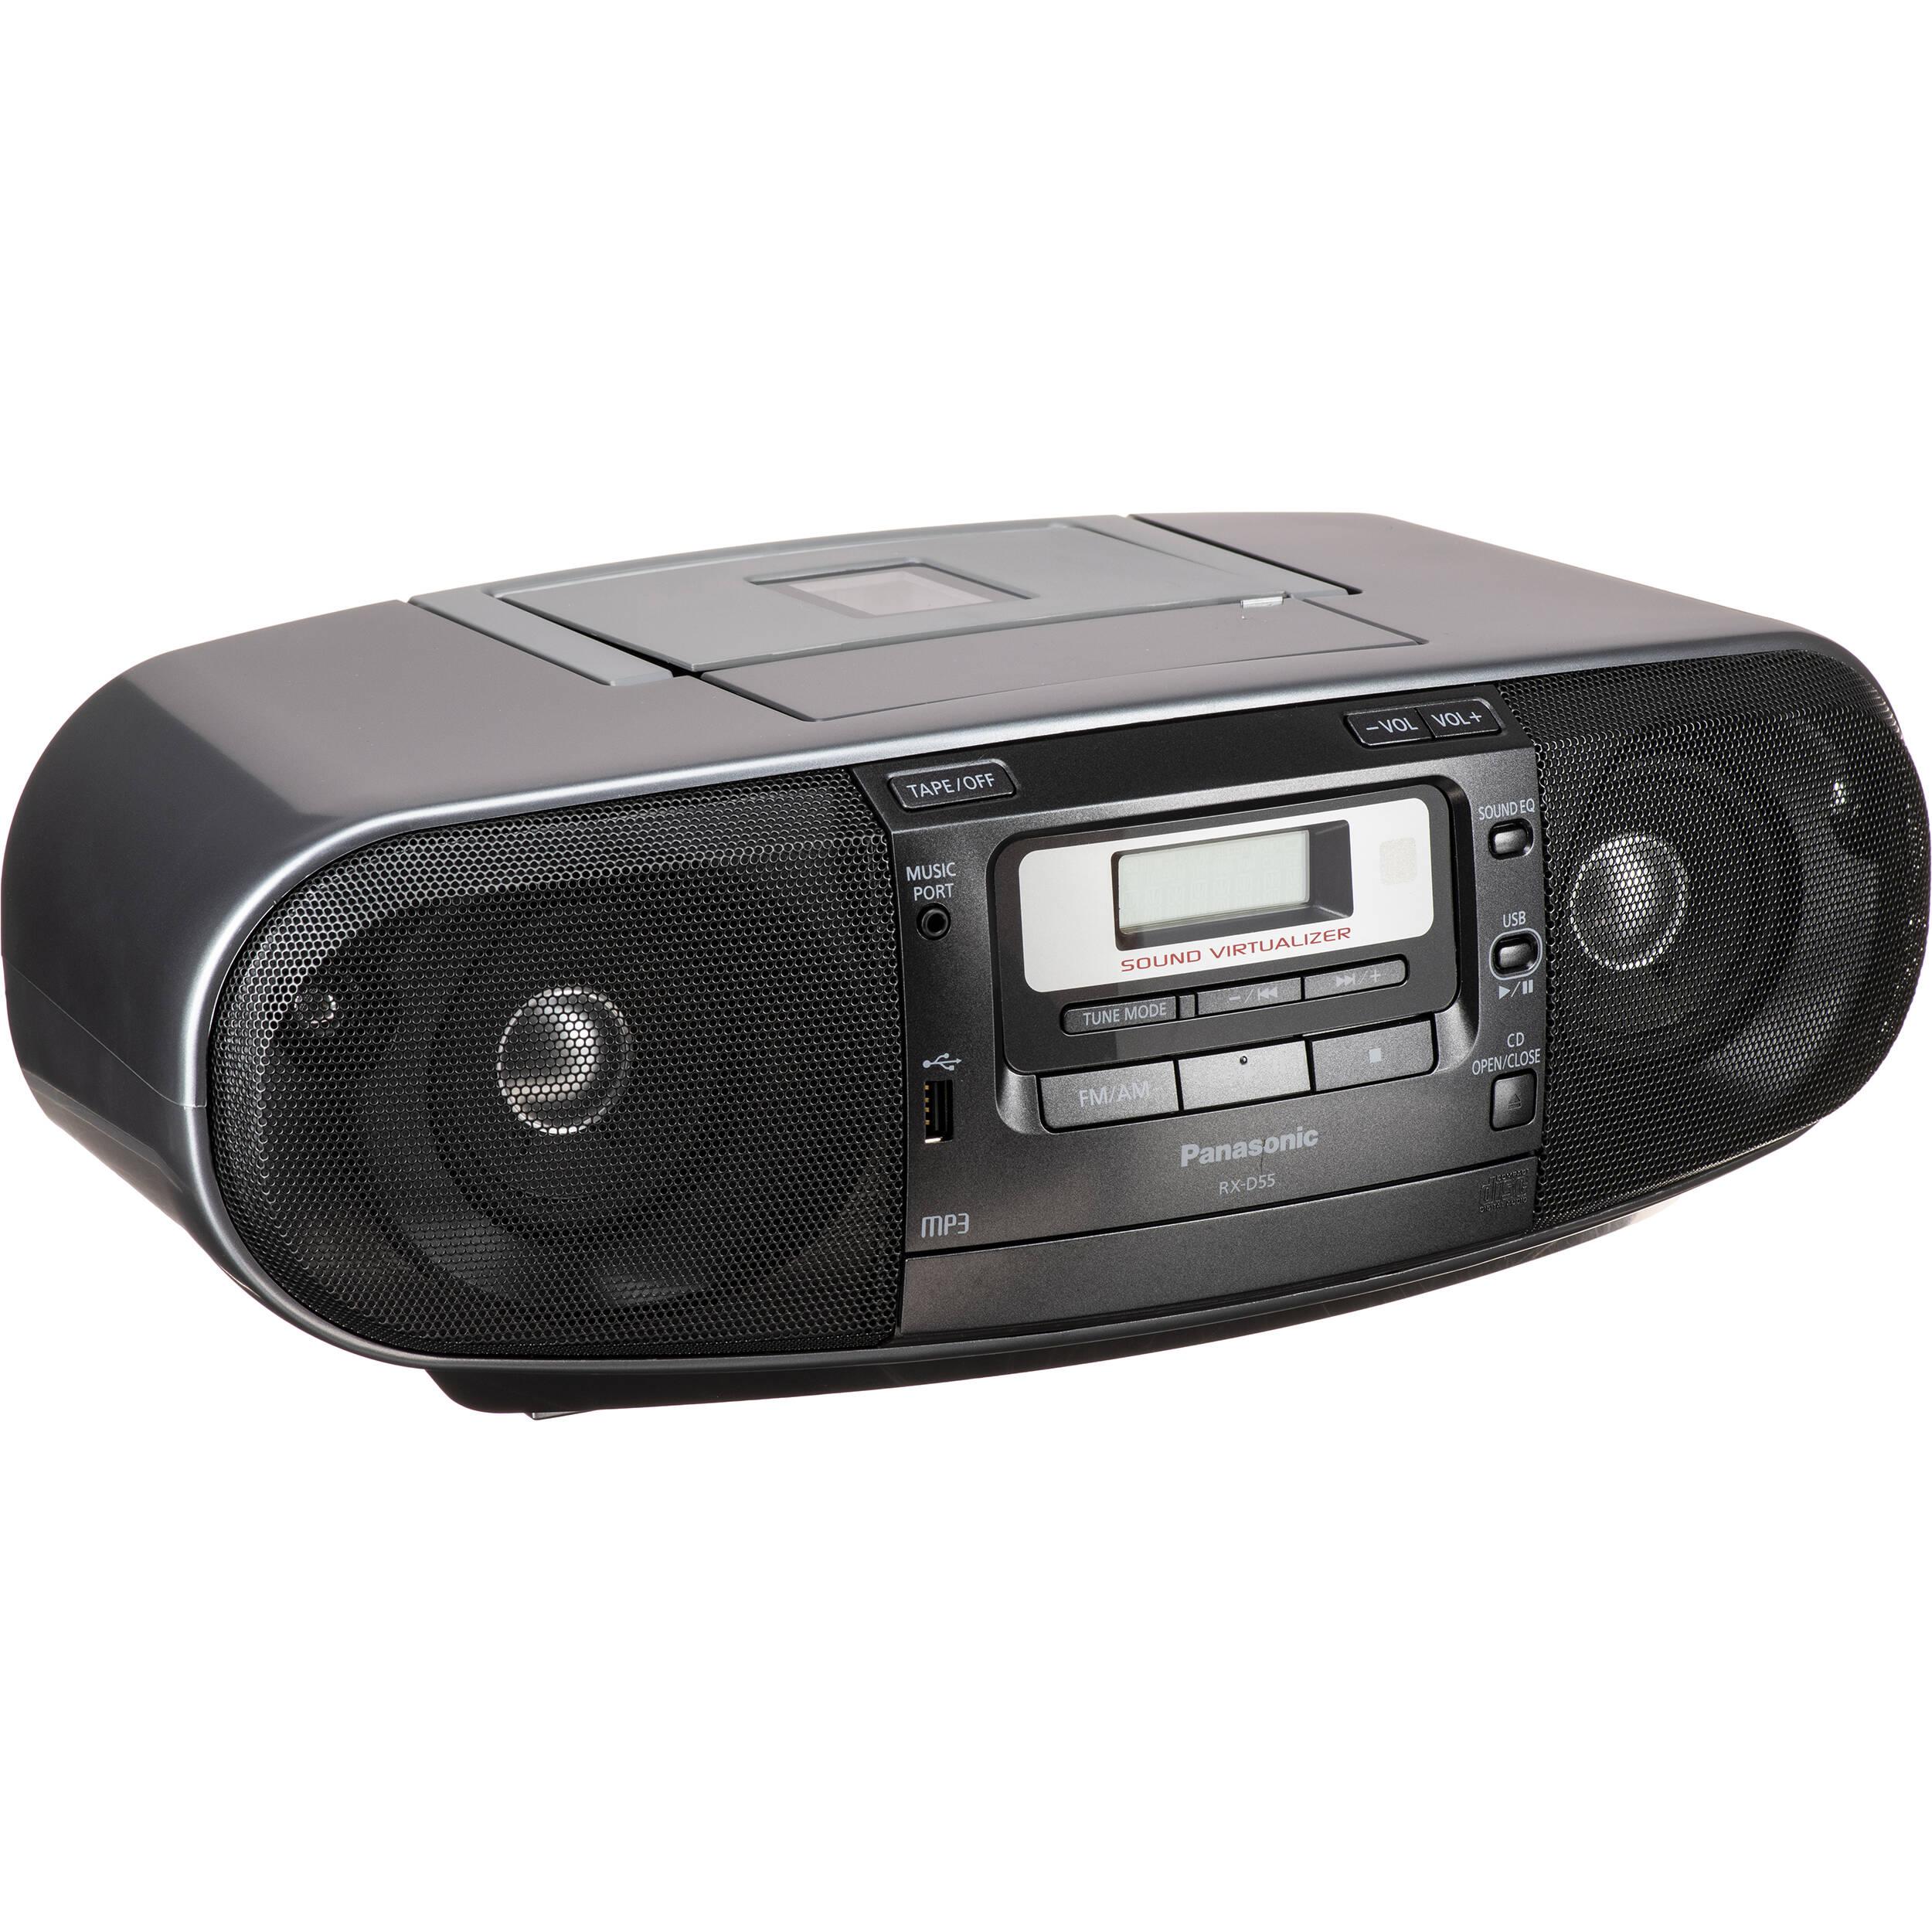 Panasonic Rx D55 Cd Radio Cassette Recorder Rx D55gc K B Amp H border=